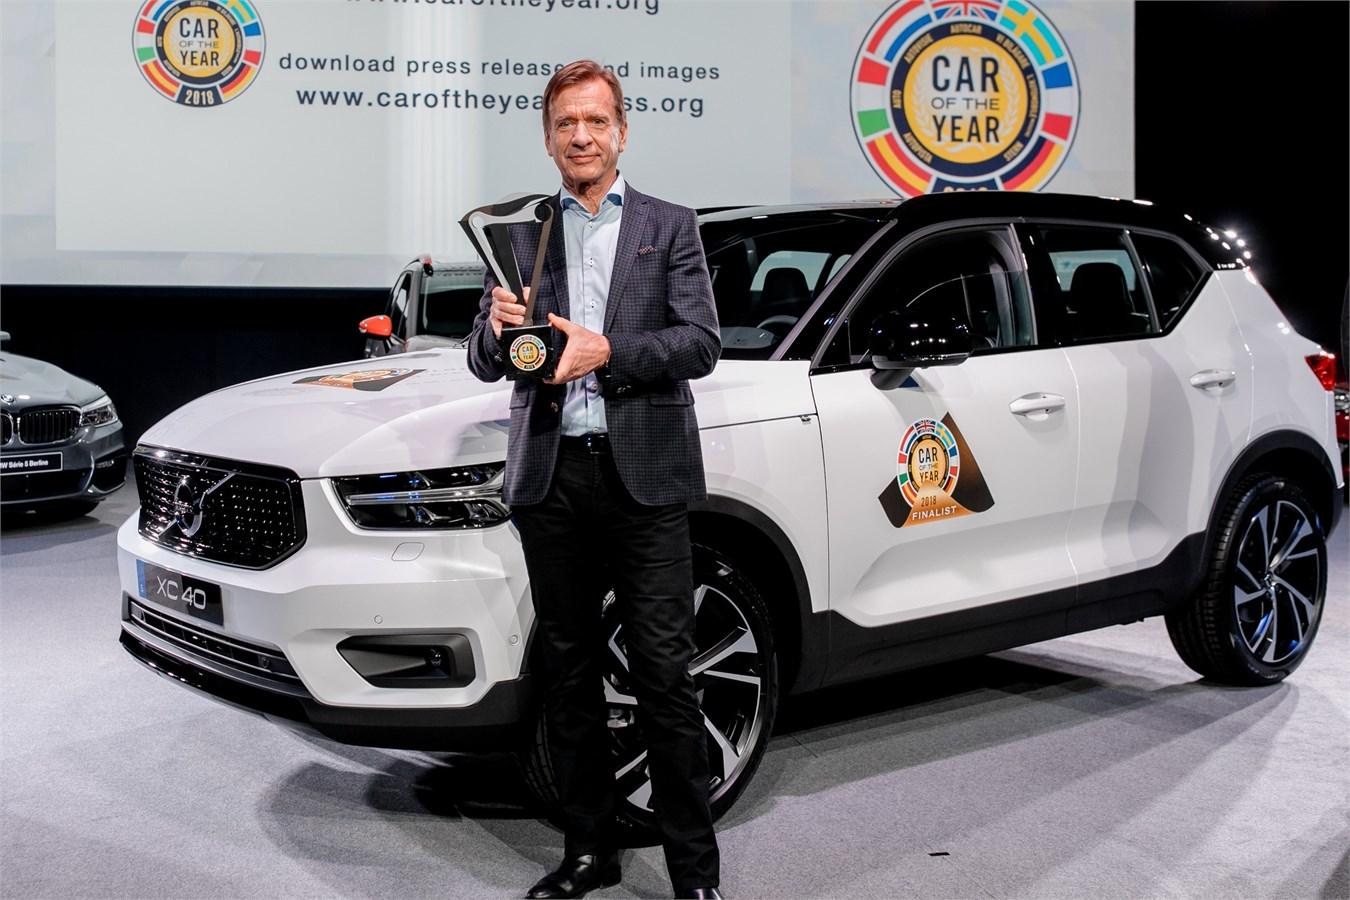 Volvo Car Group President & CEO Håkan Samuelsson at the European Car of the Year award ceremony